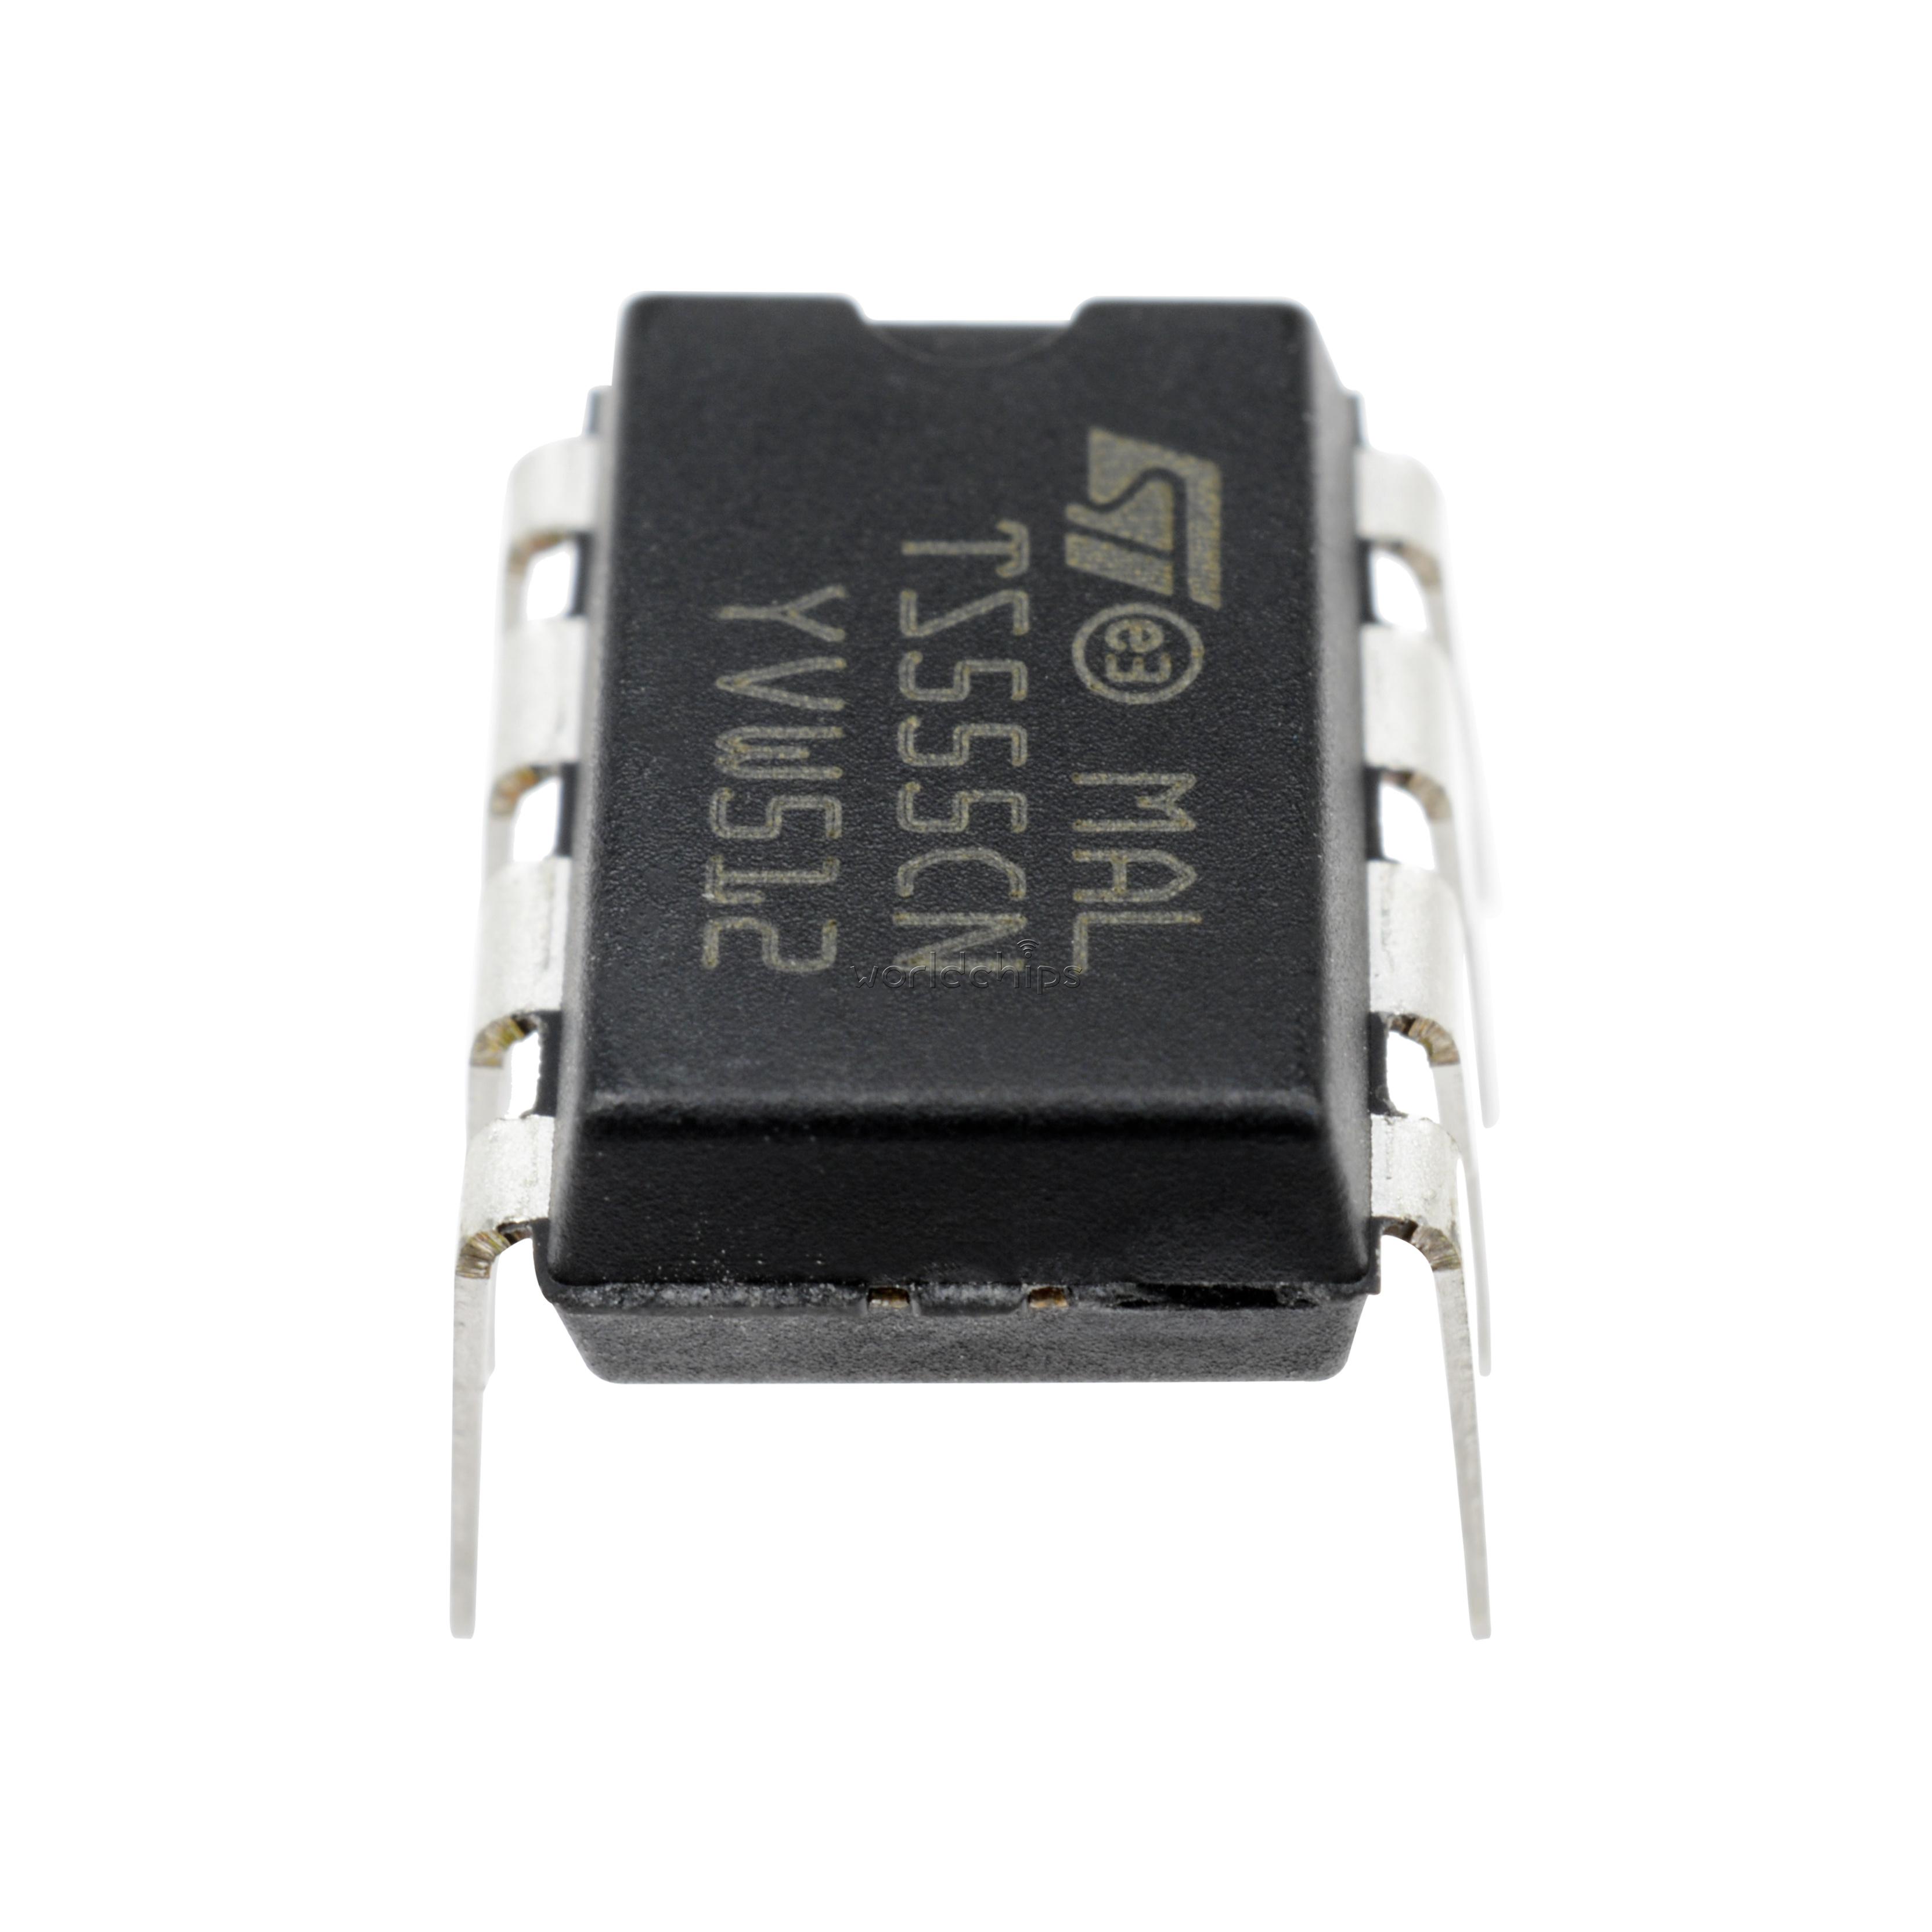 10PCS TS555CN TS555 Encapsulation:DIP-8 St Timer Low Power Cmos NEW